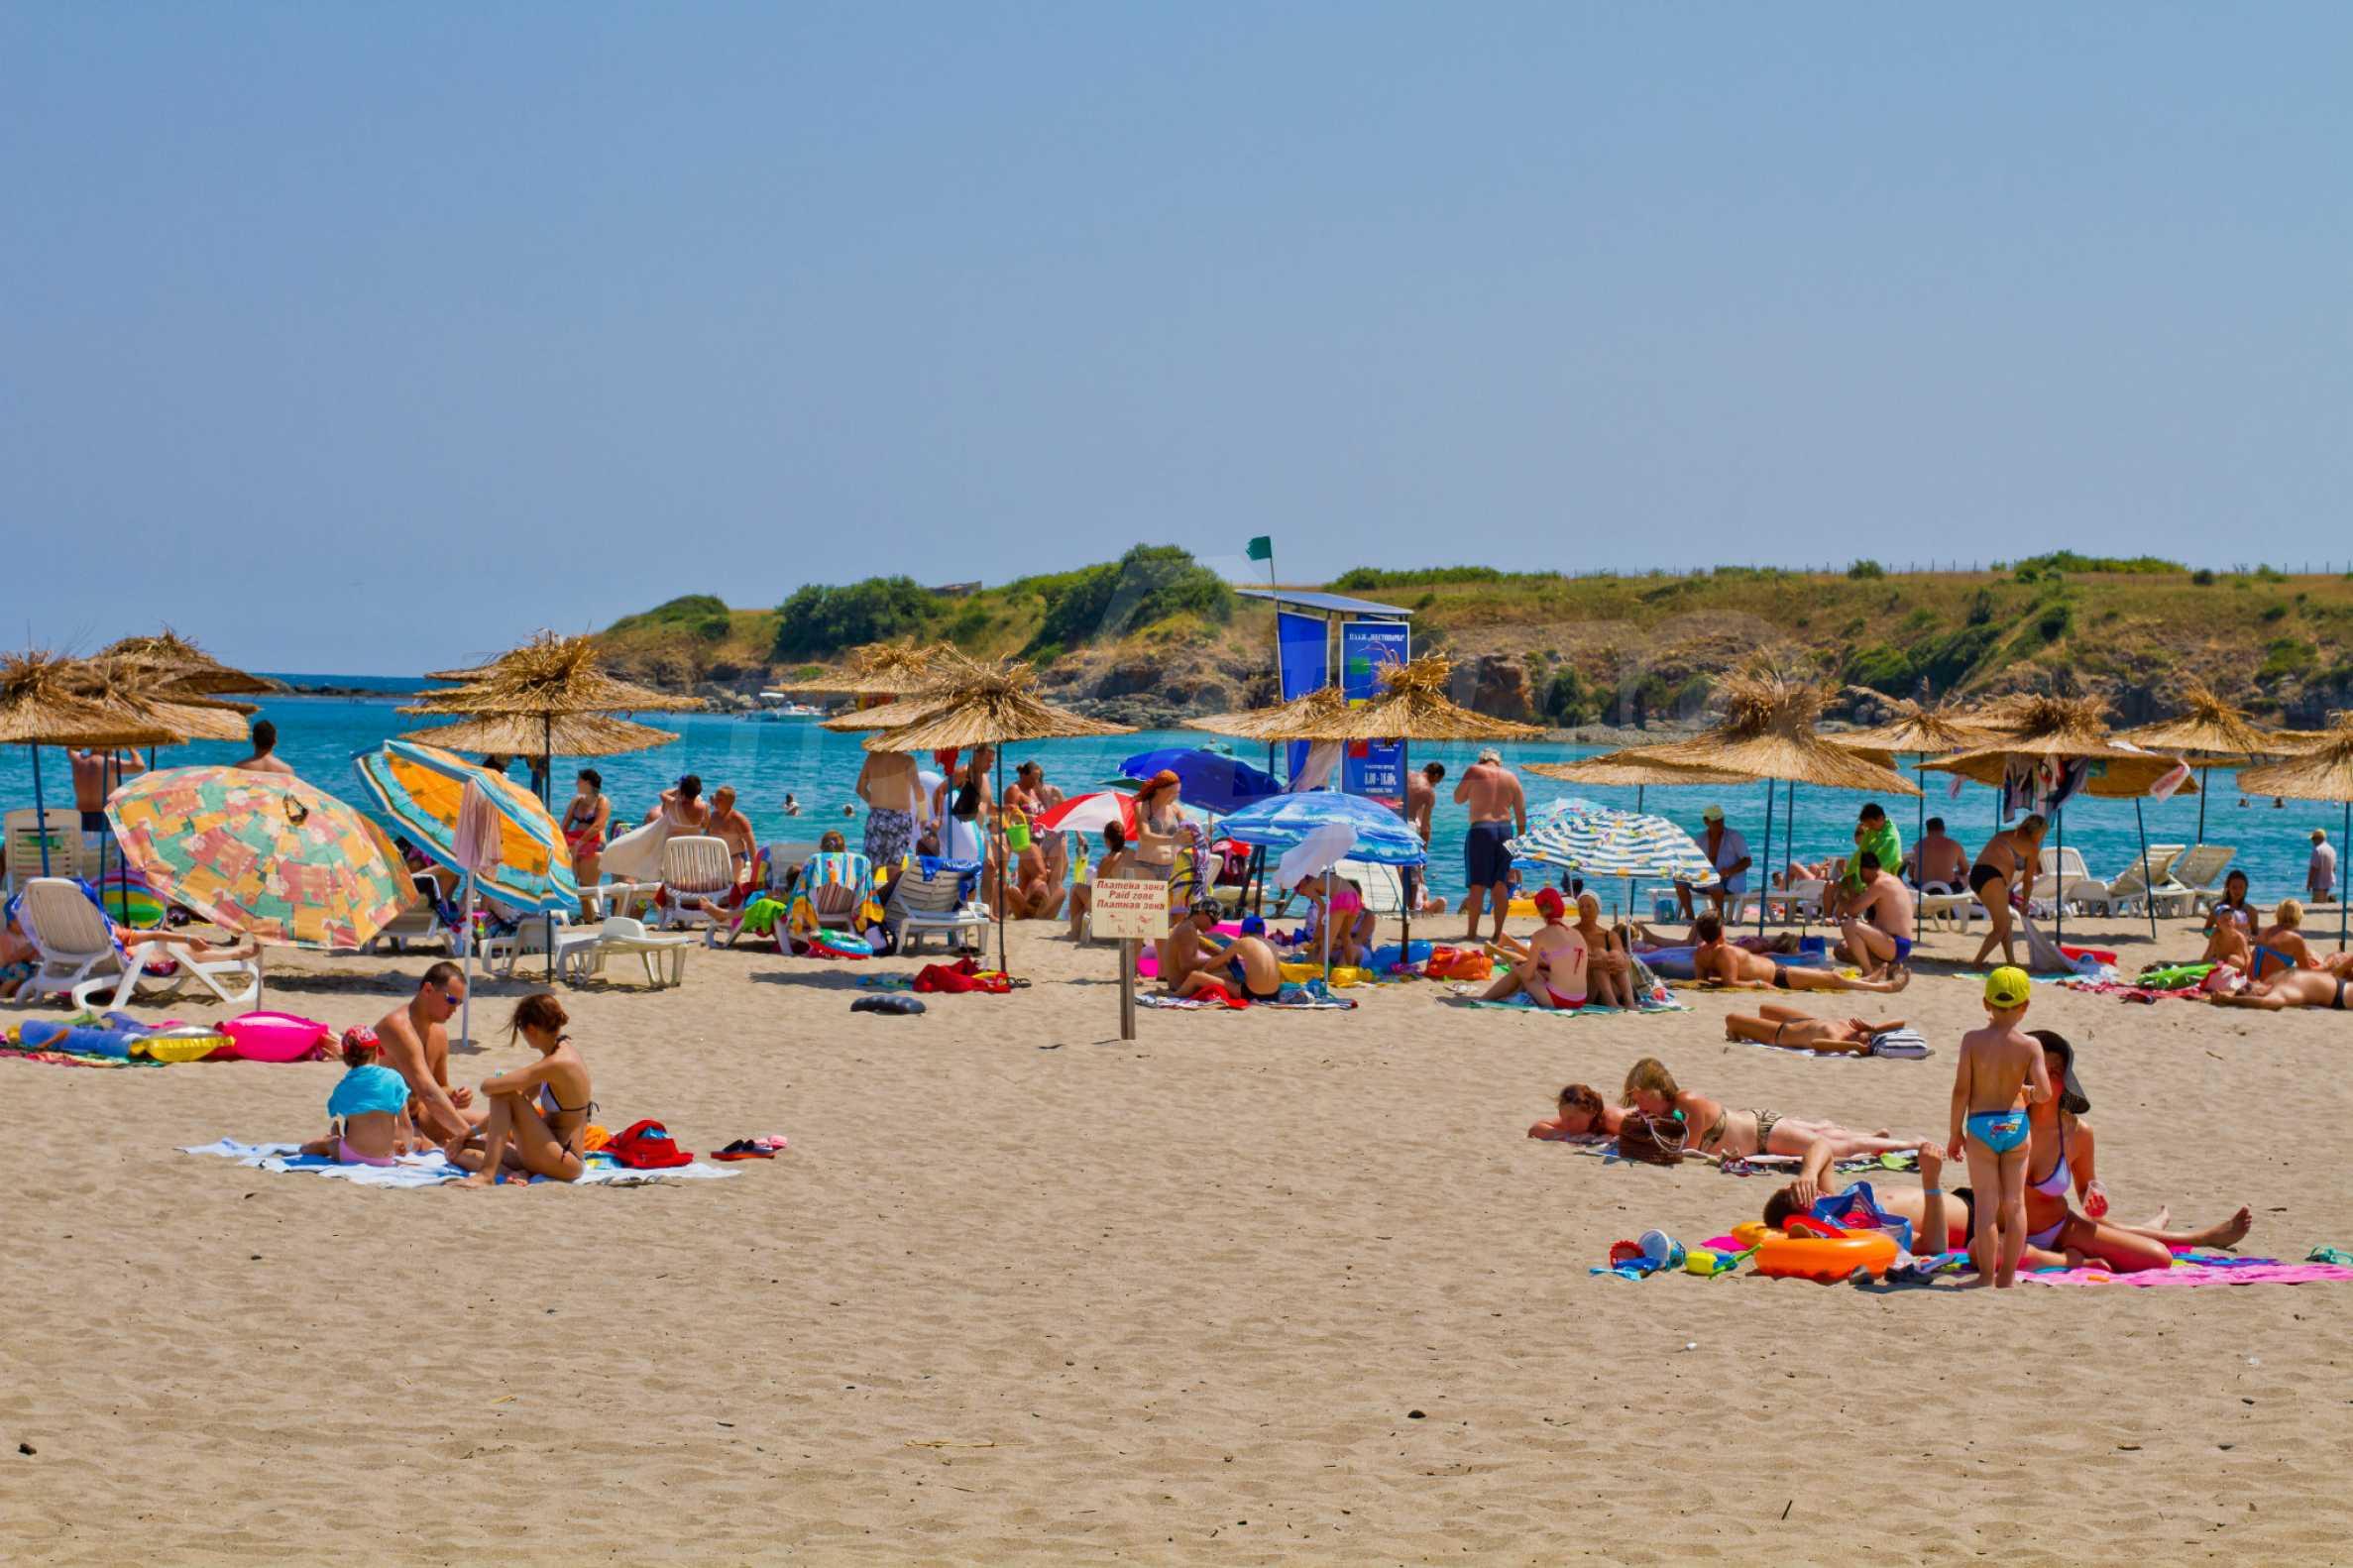 Примеа Бийч Резиденс / Primea Beach Residence 13